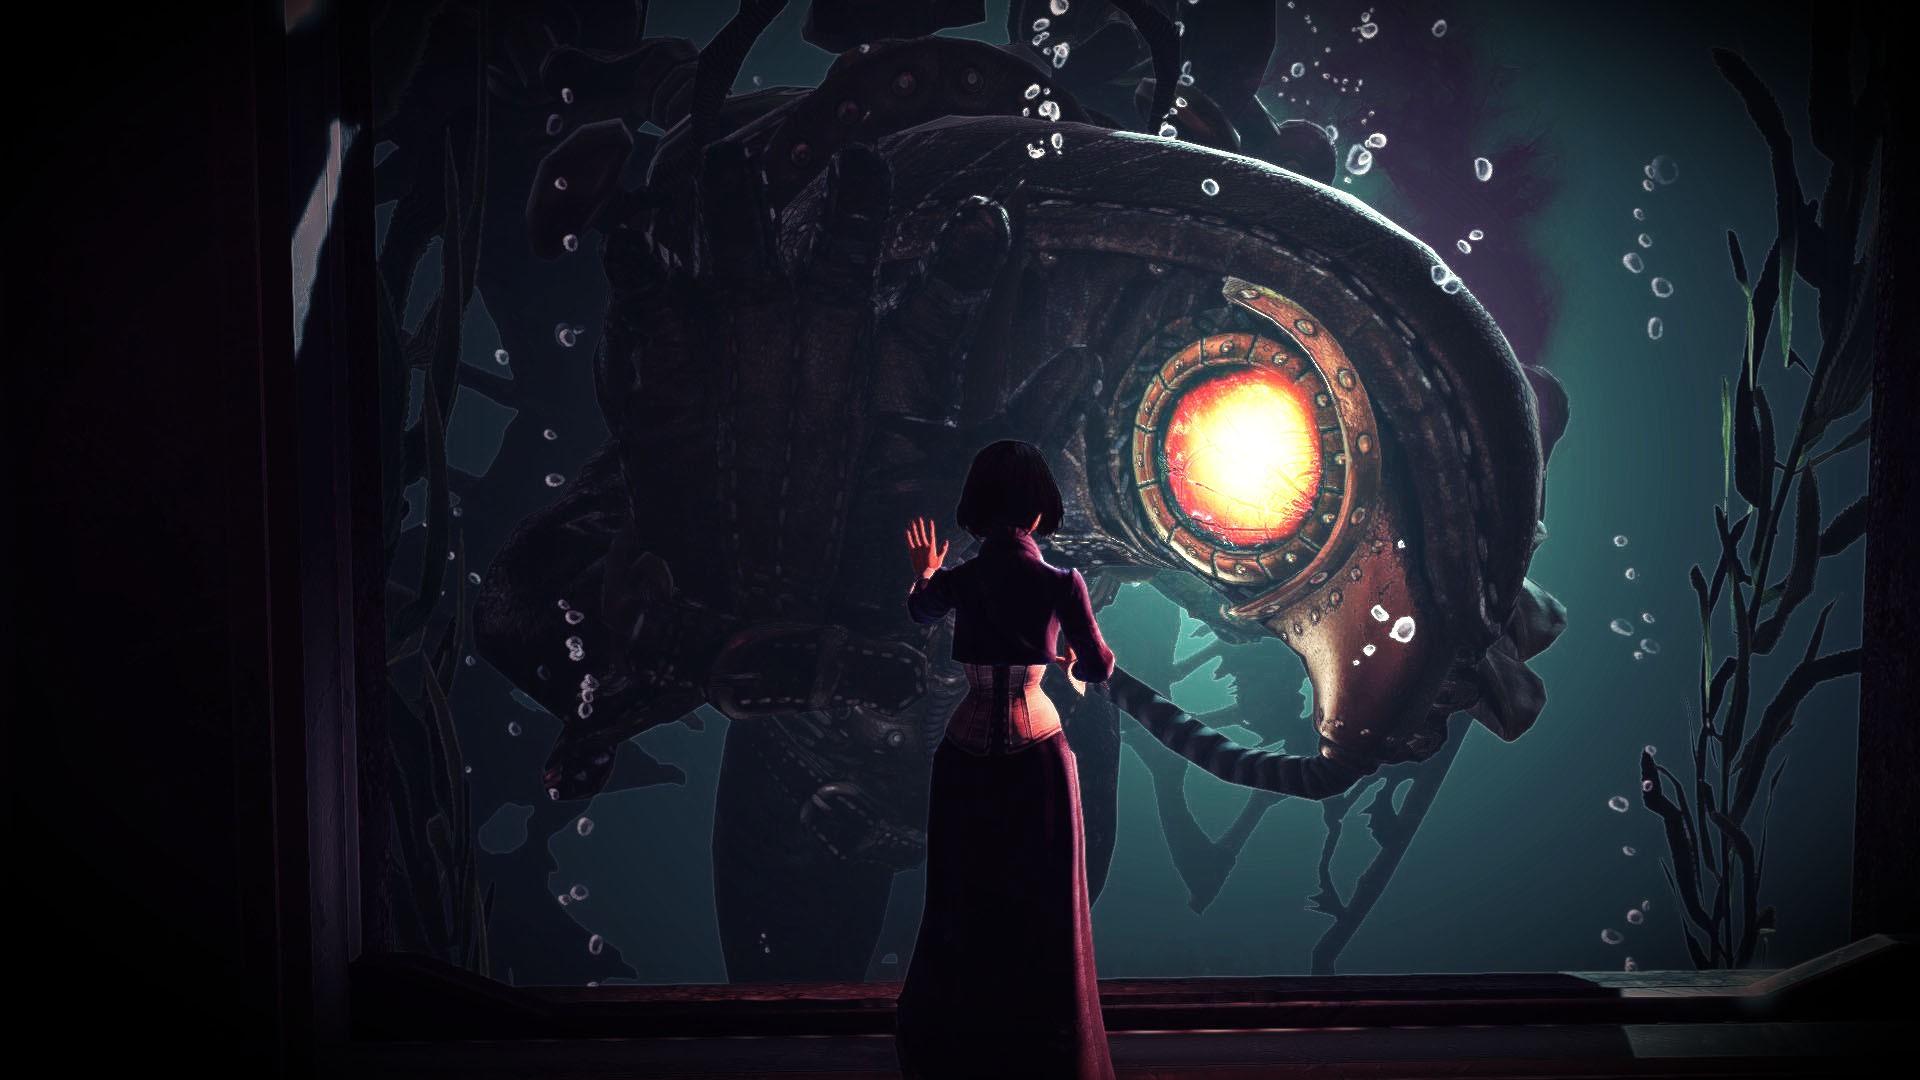 digital art video games night BioShock Infinite Songbird BioShock light darkness screenshot computer wallpaper special effects